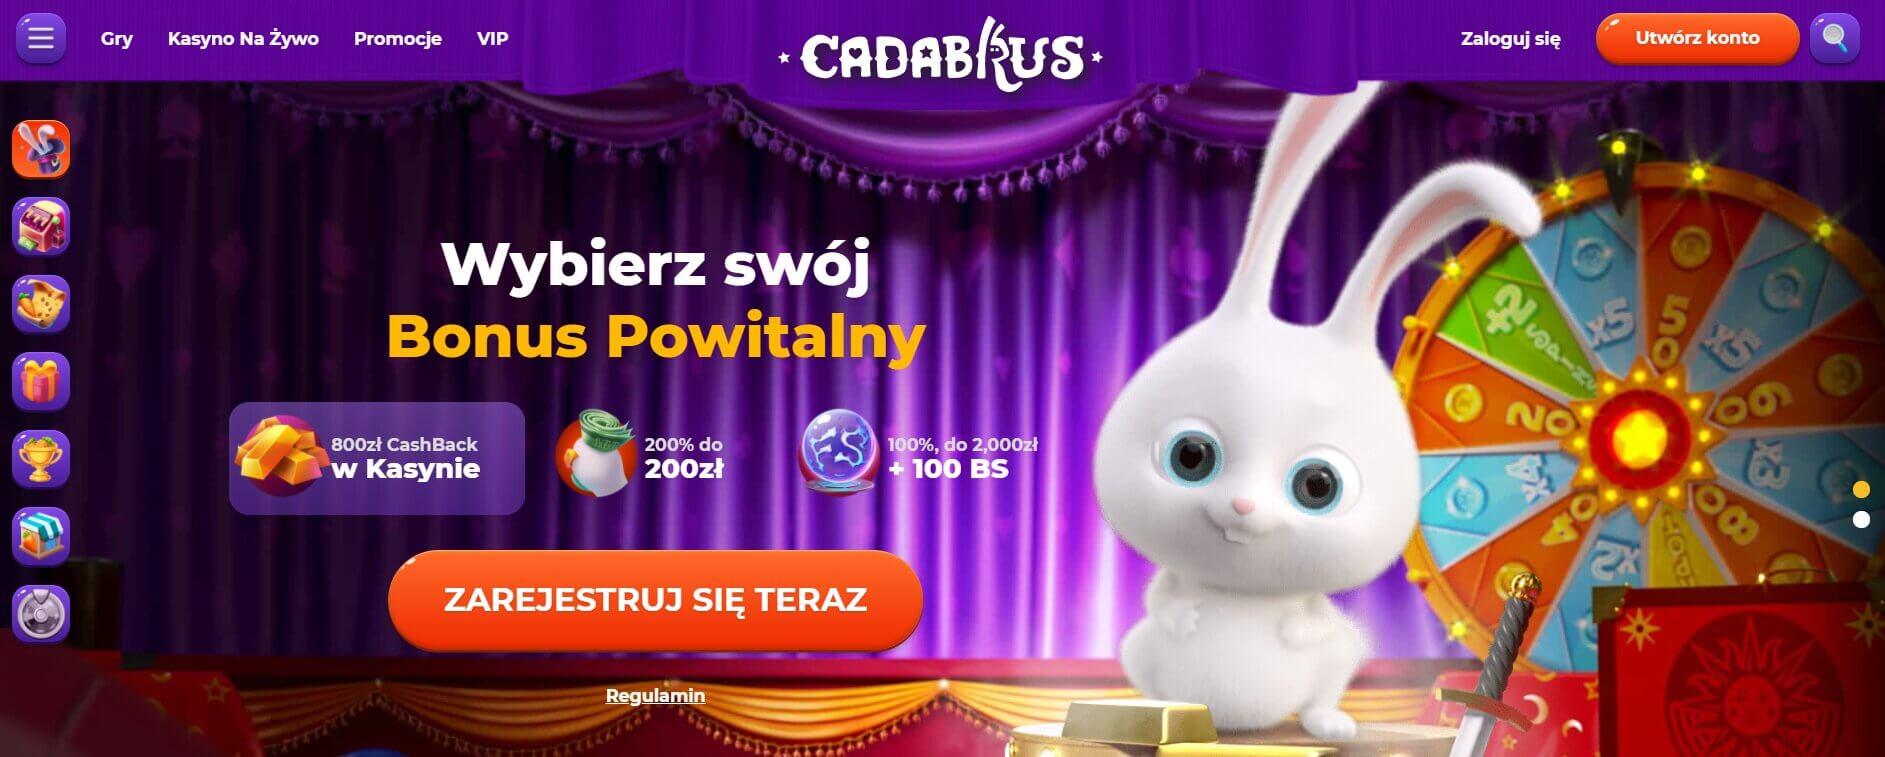 cadabrus kasyno bonusy screenshot